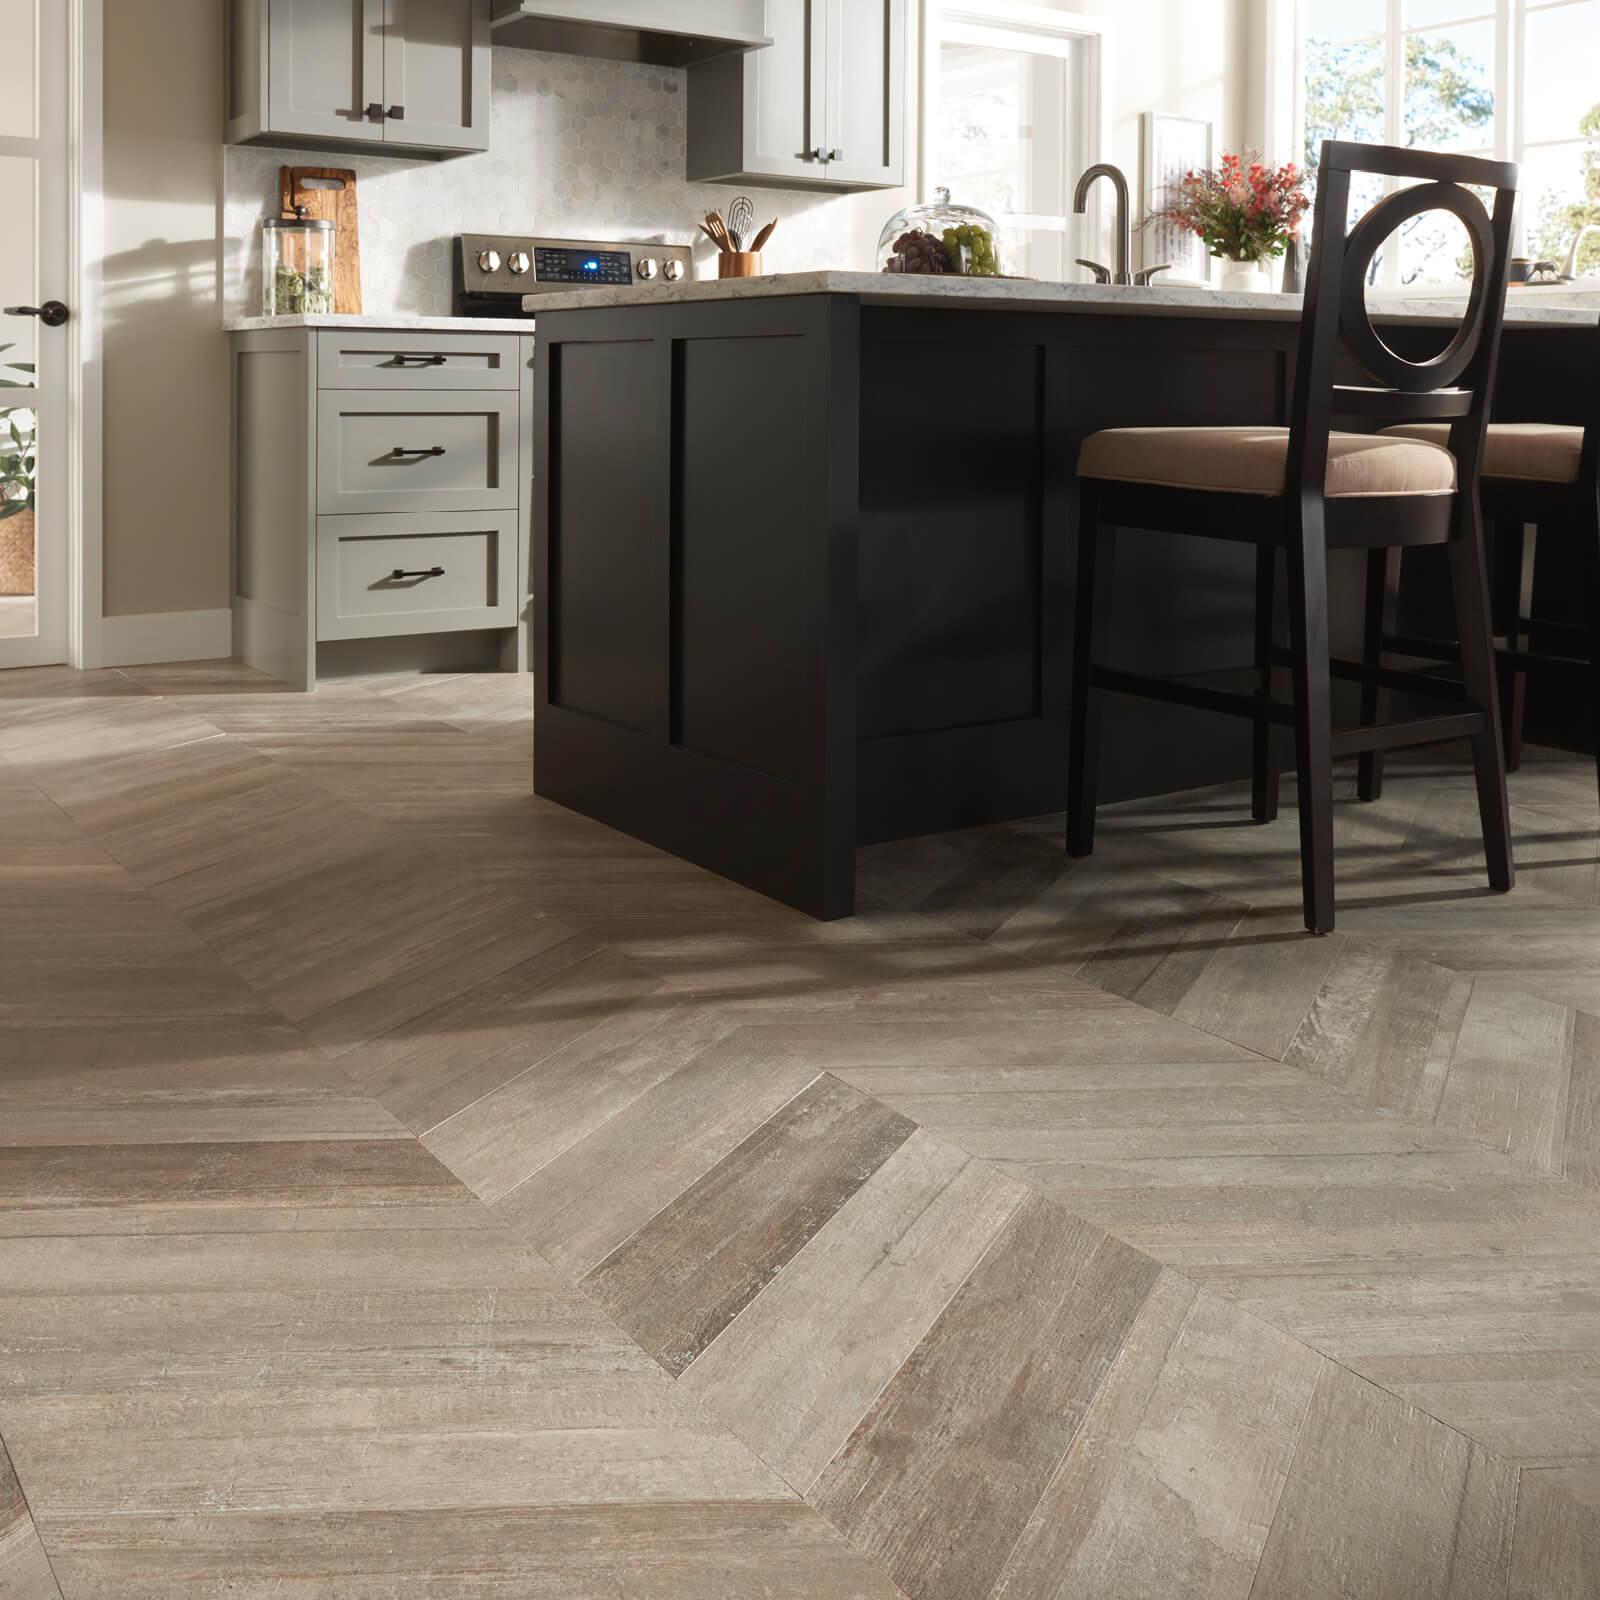 Glee chevron flooring | Bram Flooring